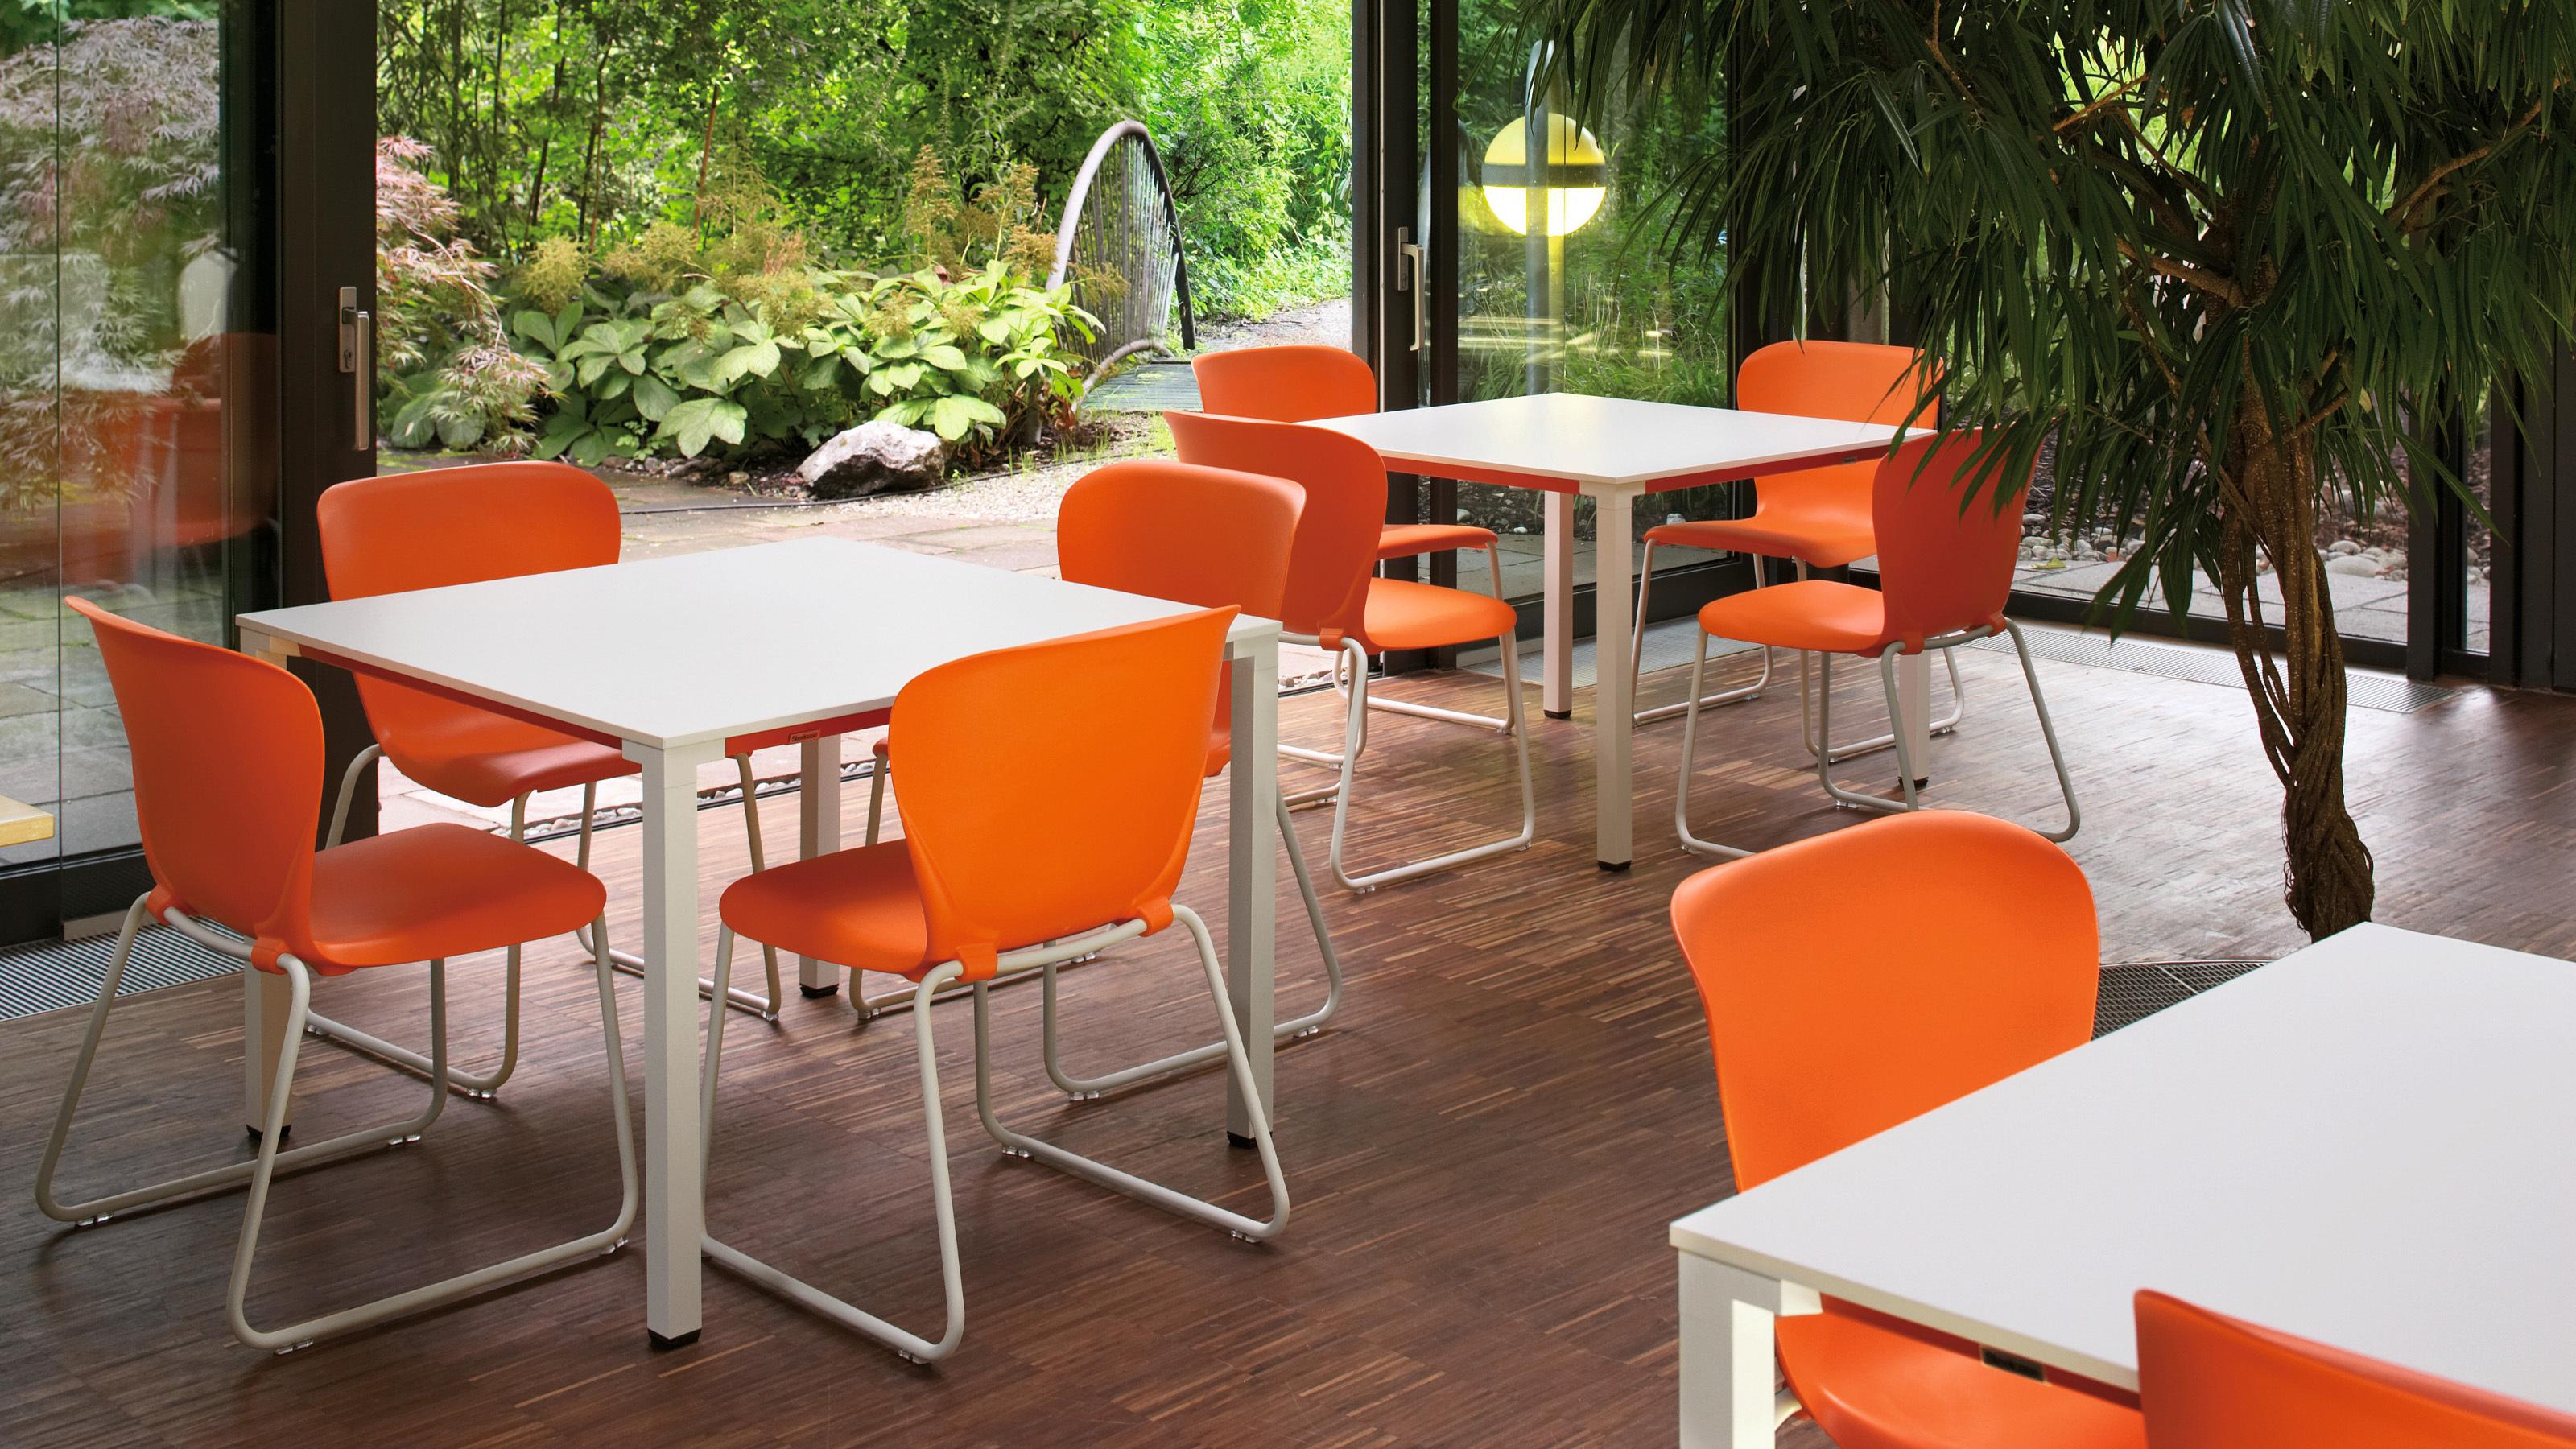 kalidro conferencing von steelcase stylepark. Black Bedroom Furniture Sets. Home Design Ideas